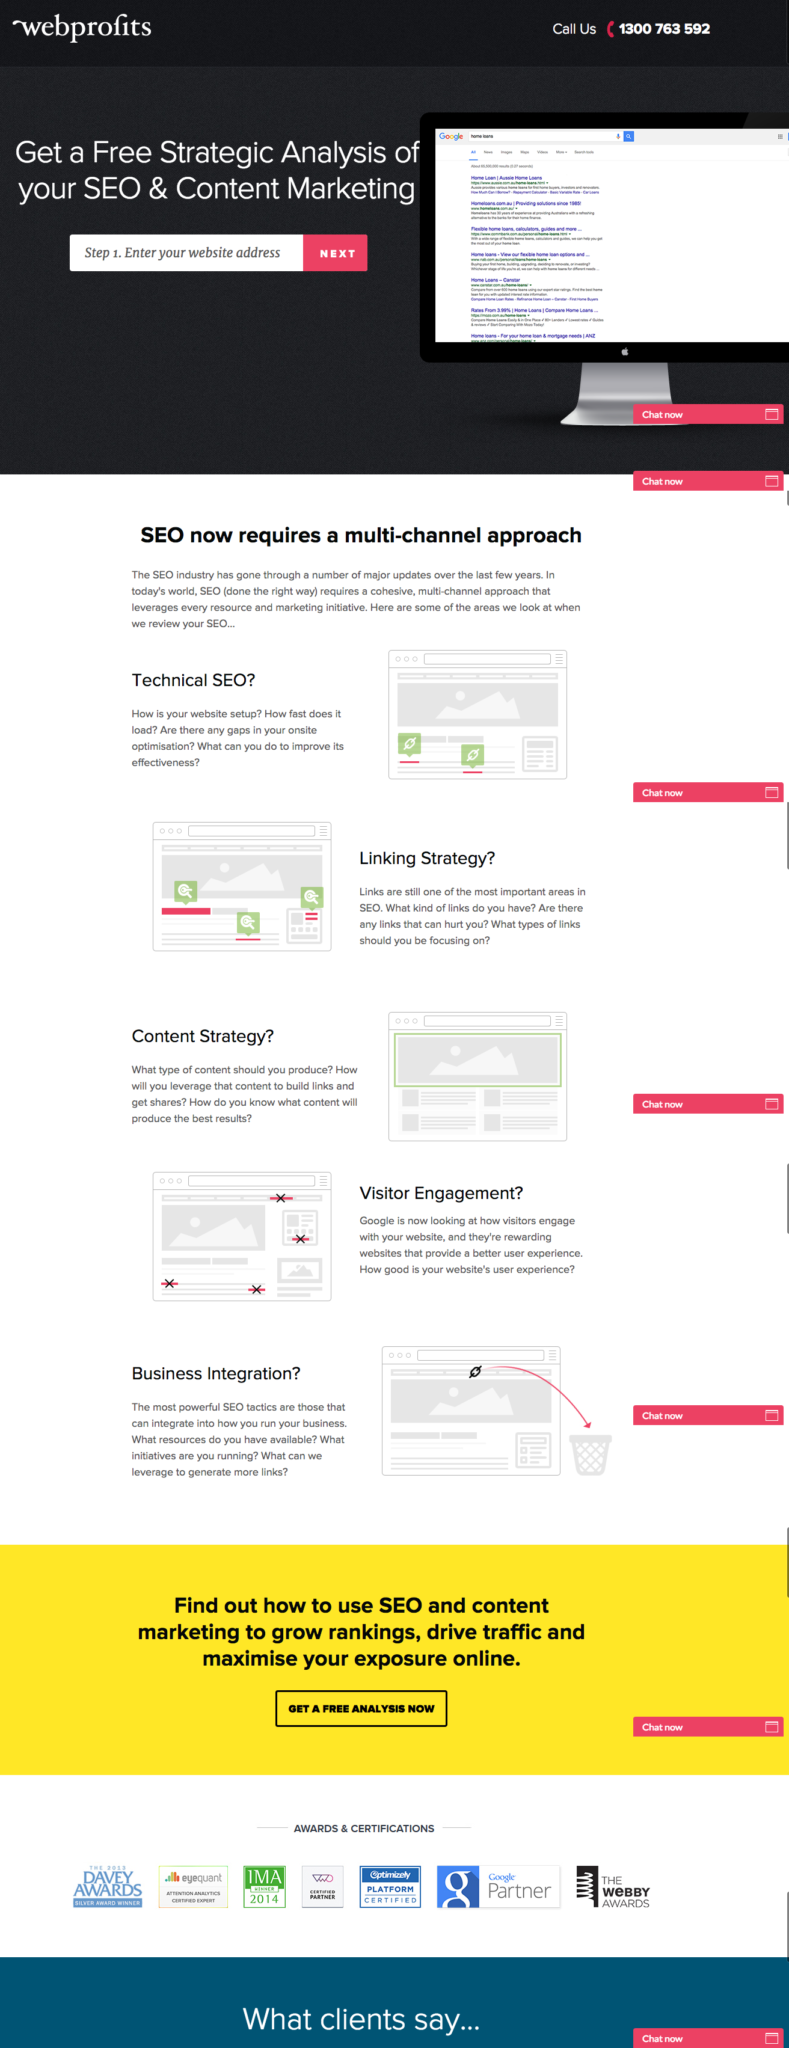 campagne con landing pages di successo: Webprofits